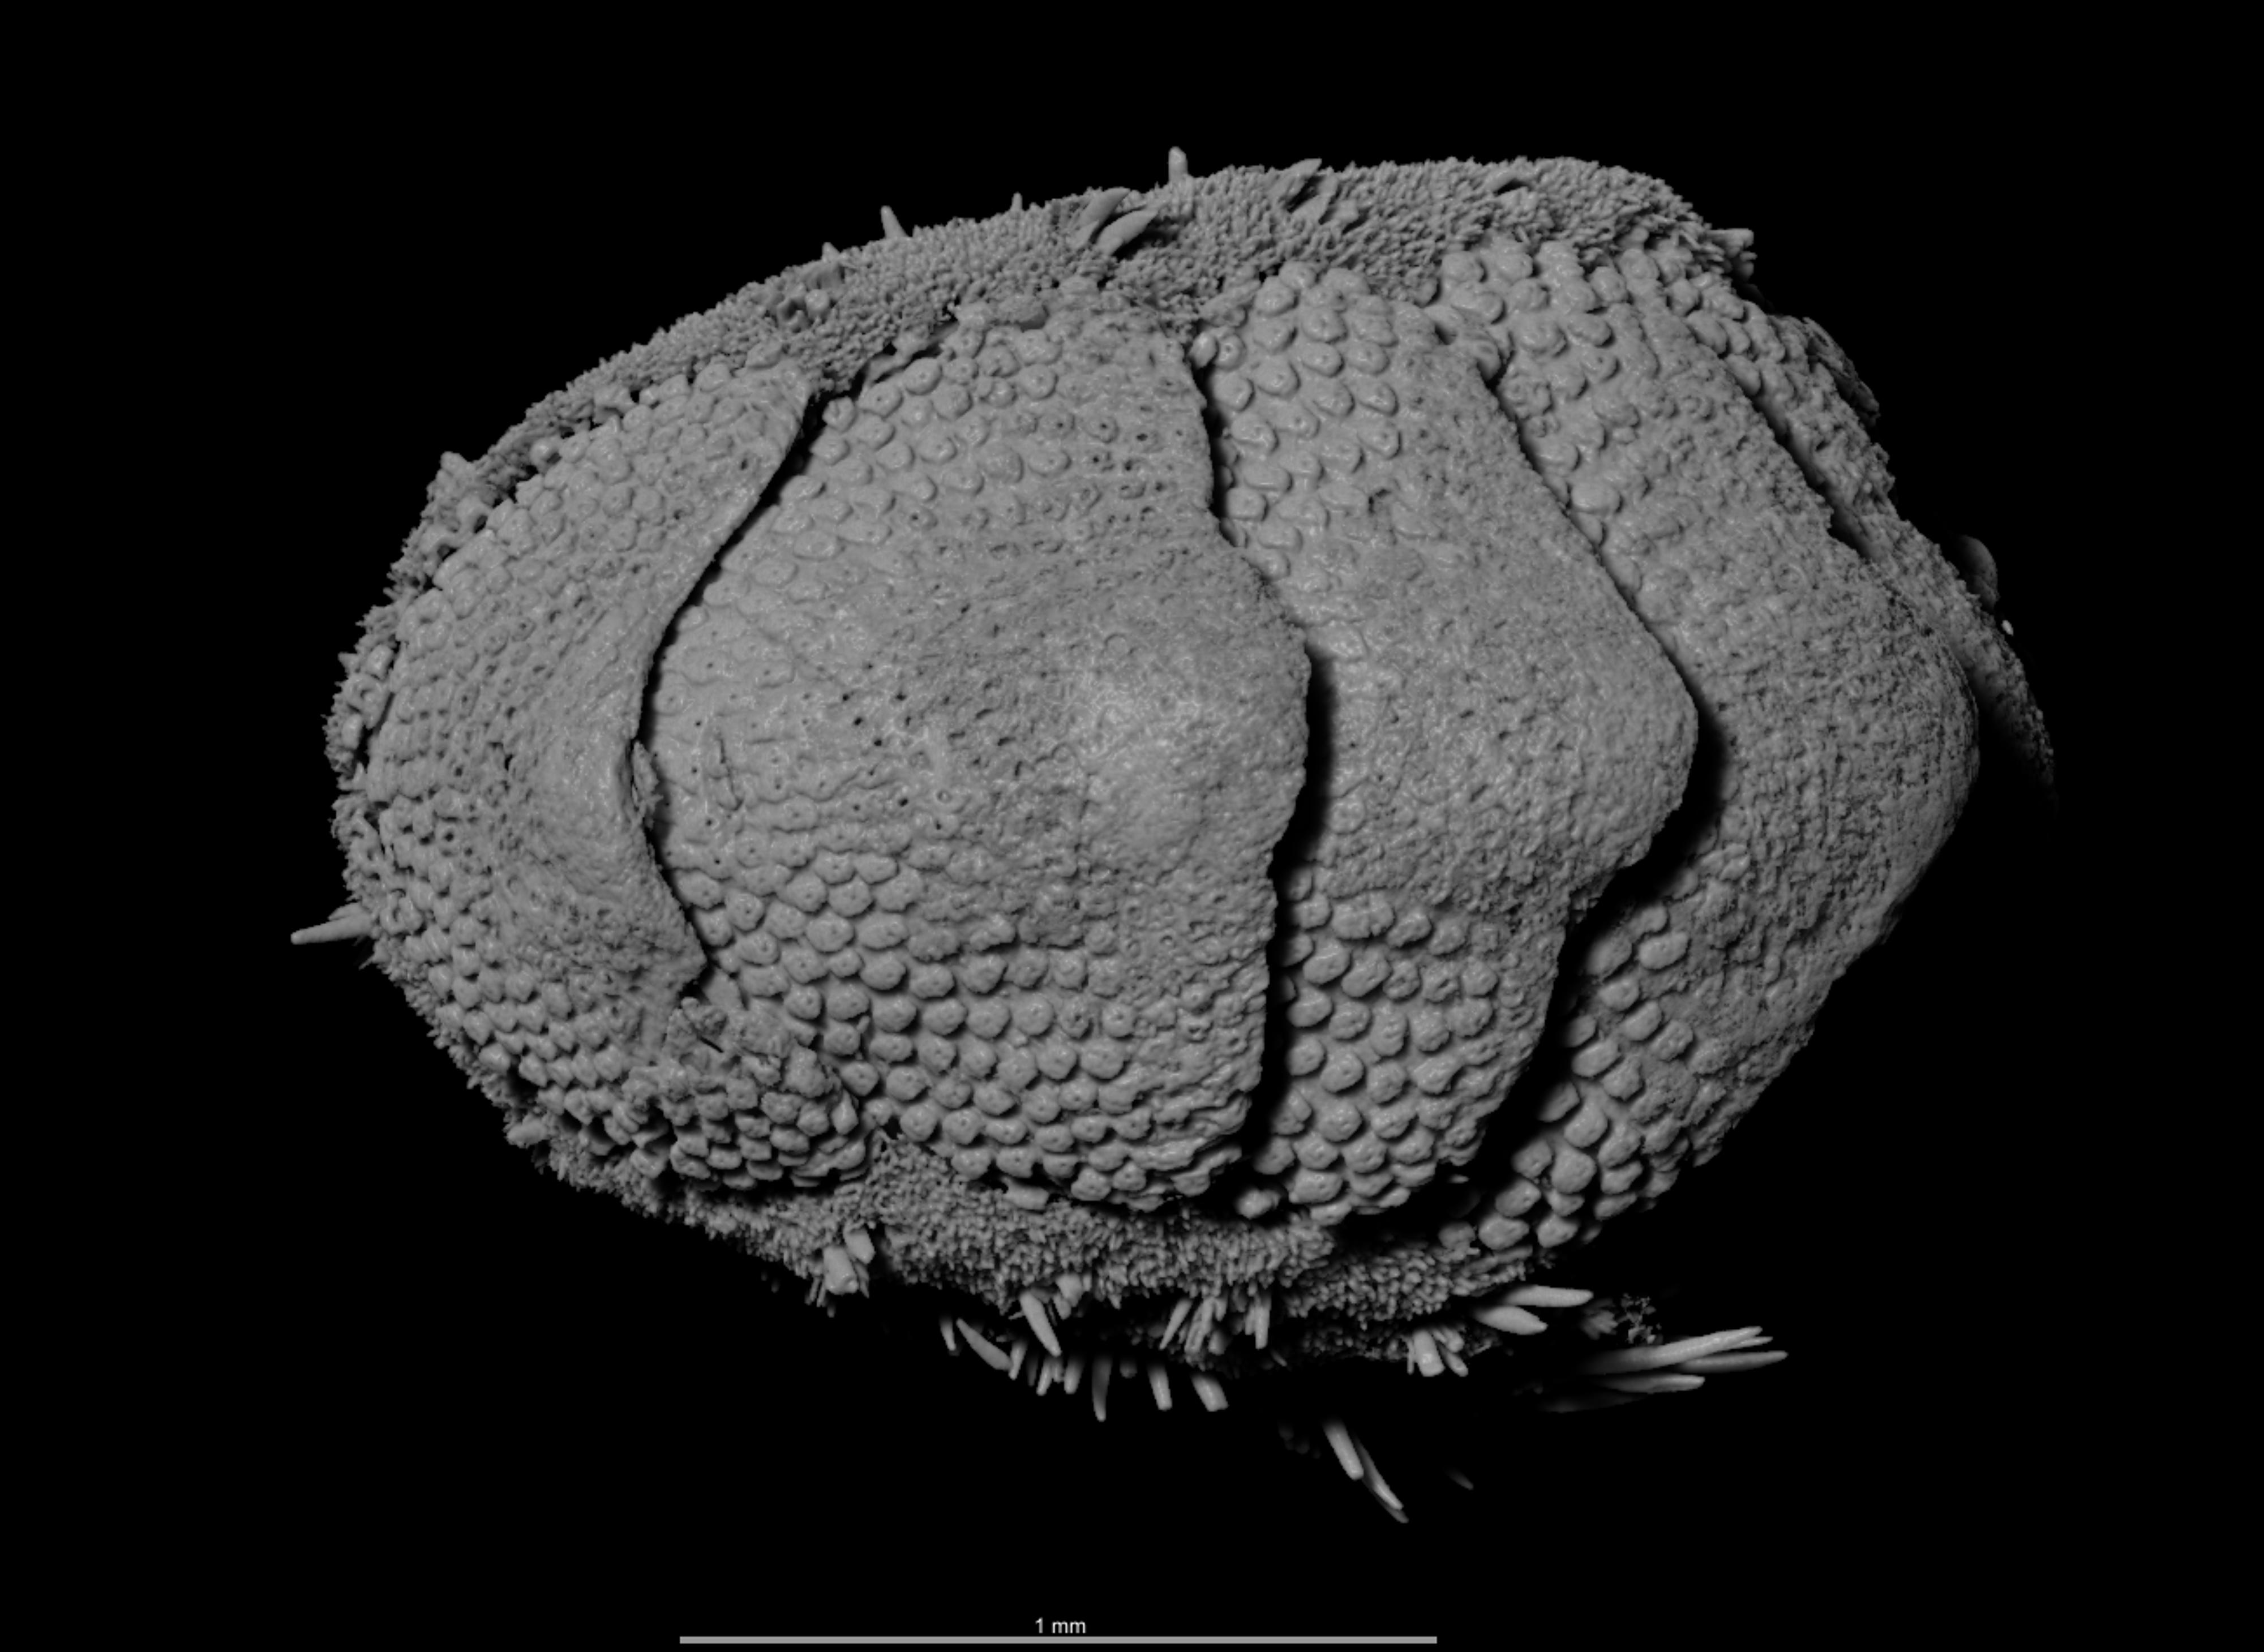 BE-RBINS-INV HOLOTYPE MT.2960/1 Acanthochiton minutus MICROCT XRE ANTERODORSAL.jpg